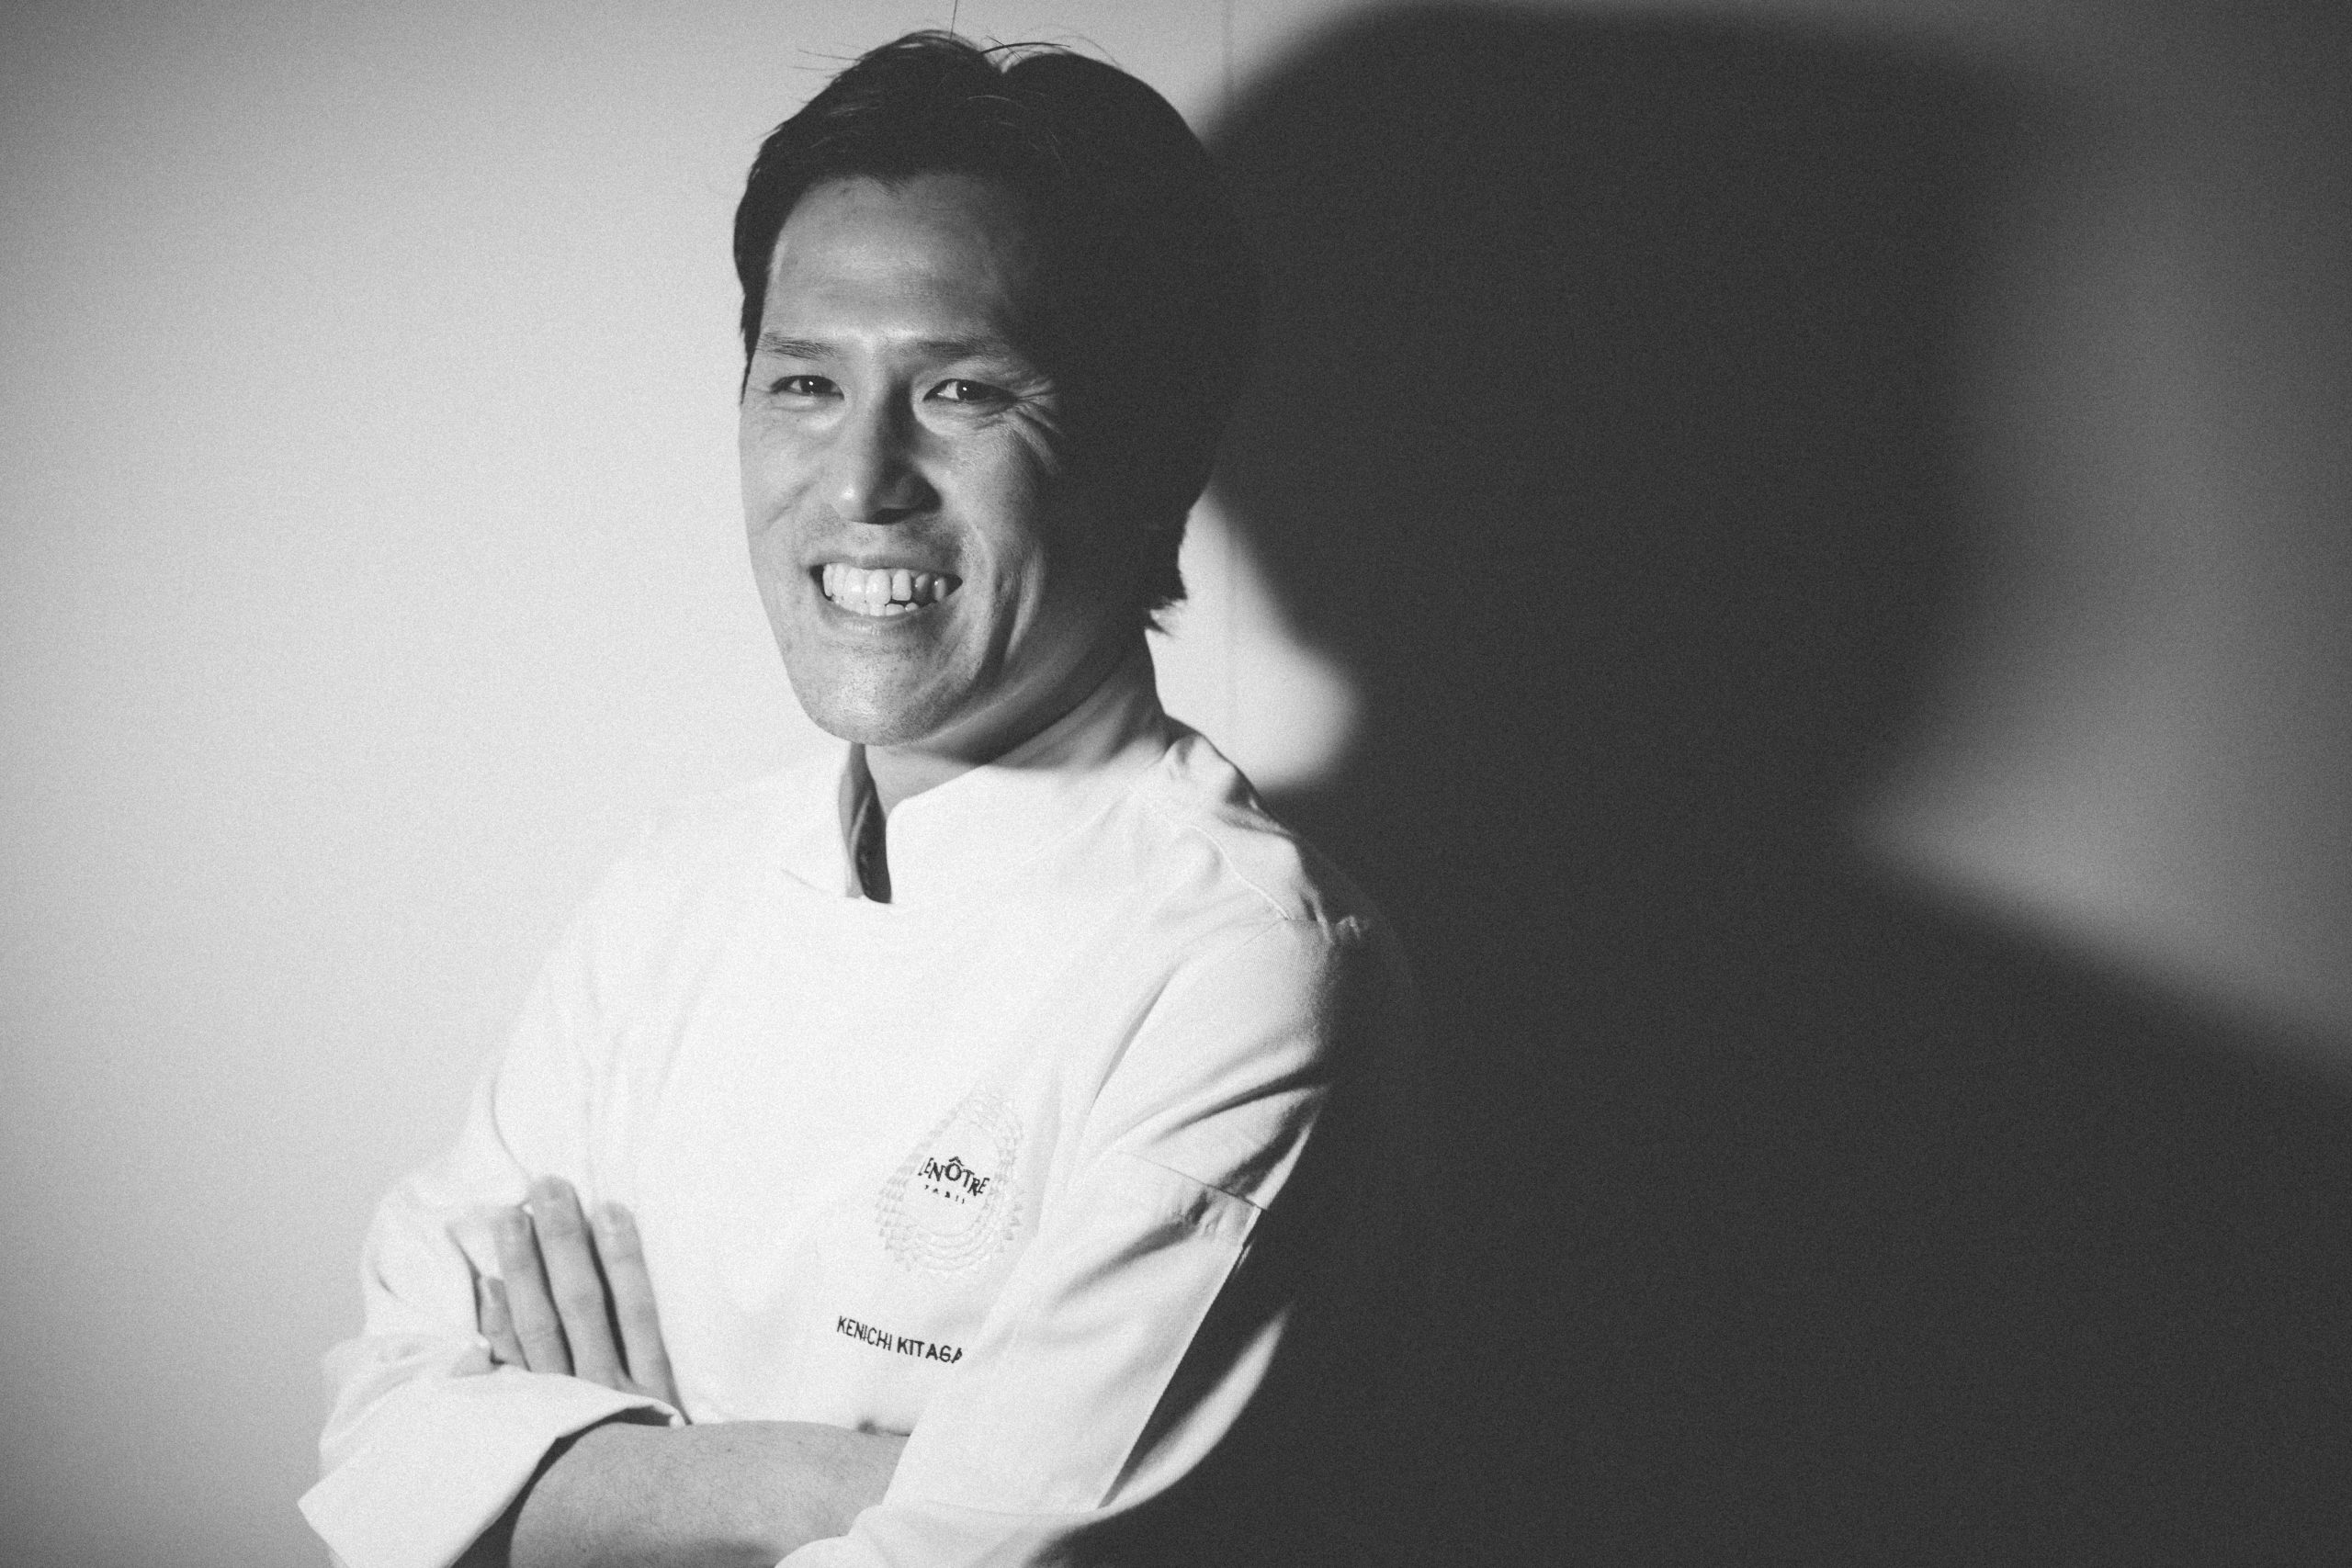 mikiのショコラティエ探訪記、次回は日本の責任者北川健一シェフへインタビュー